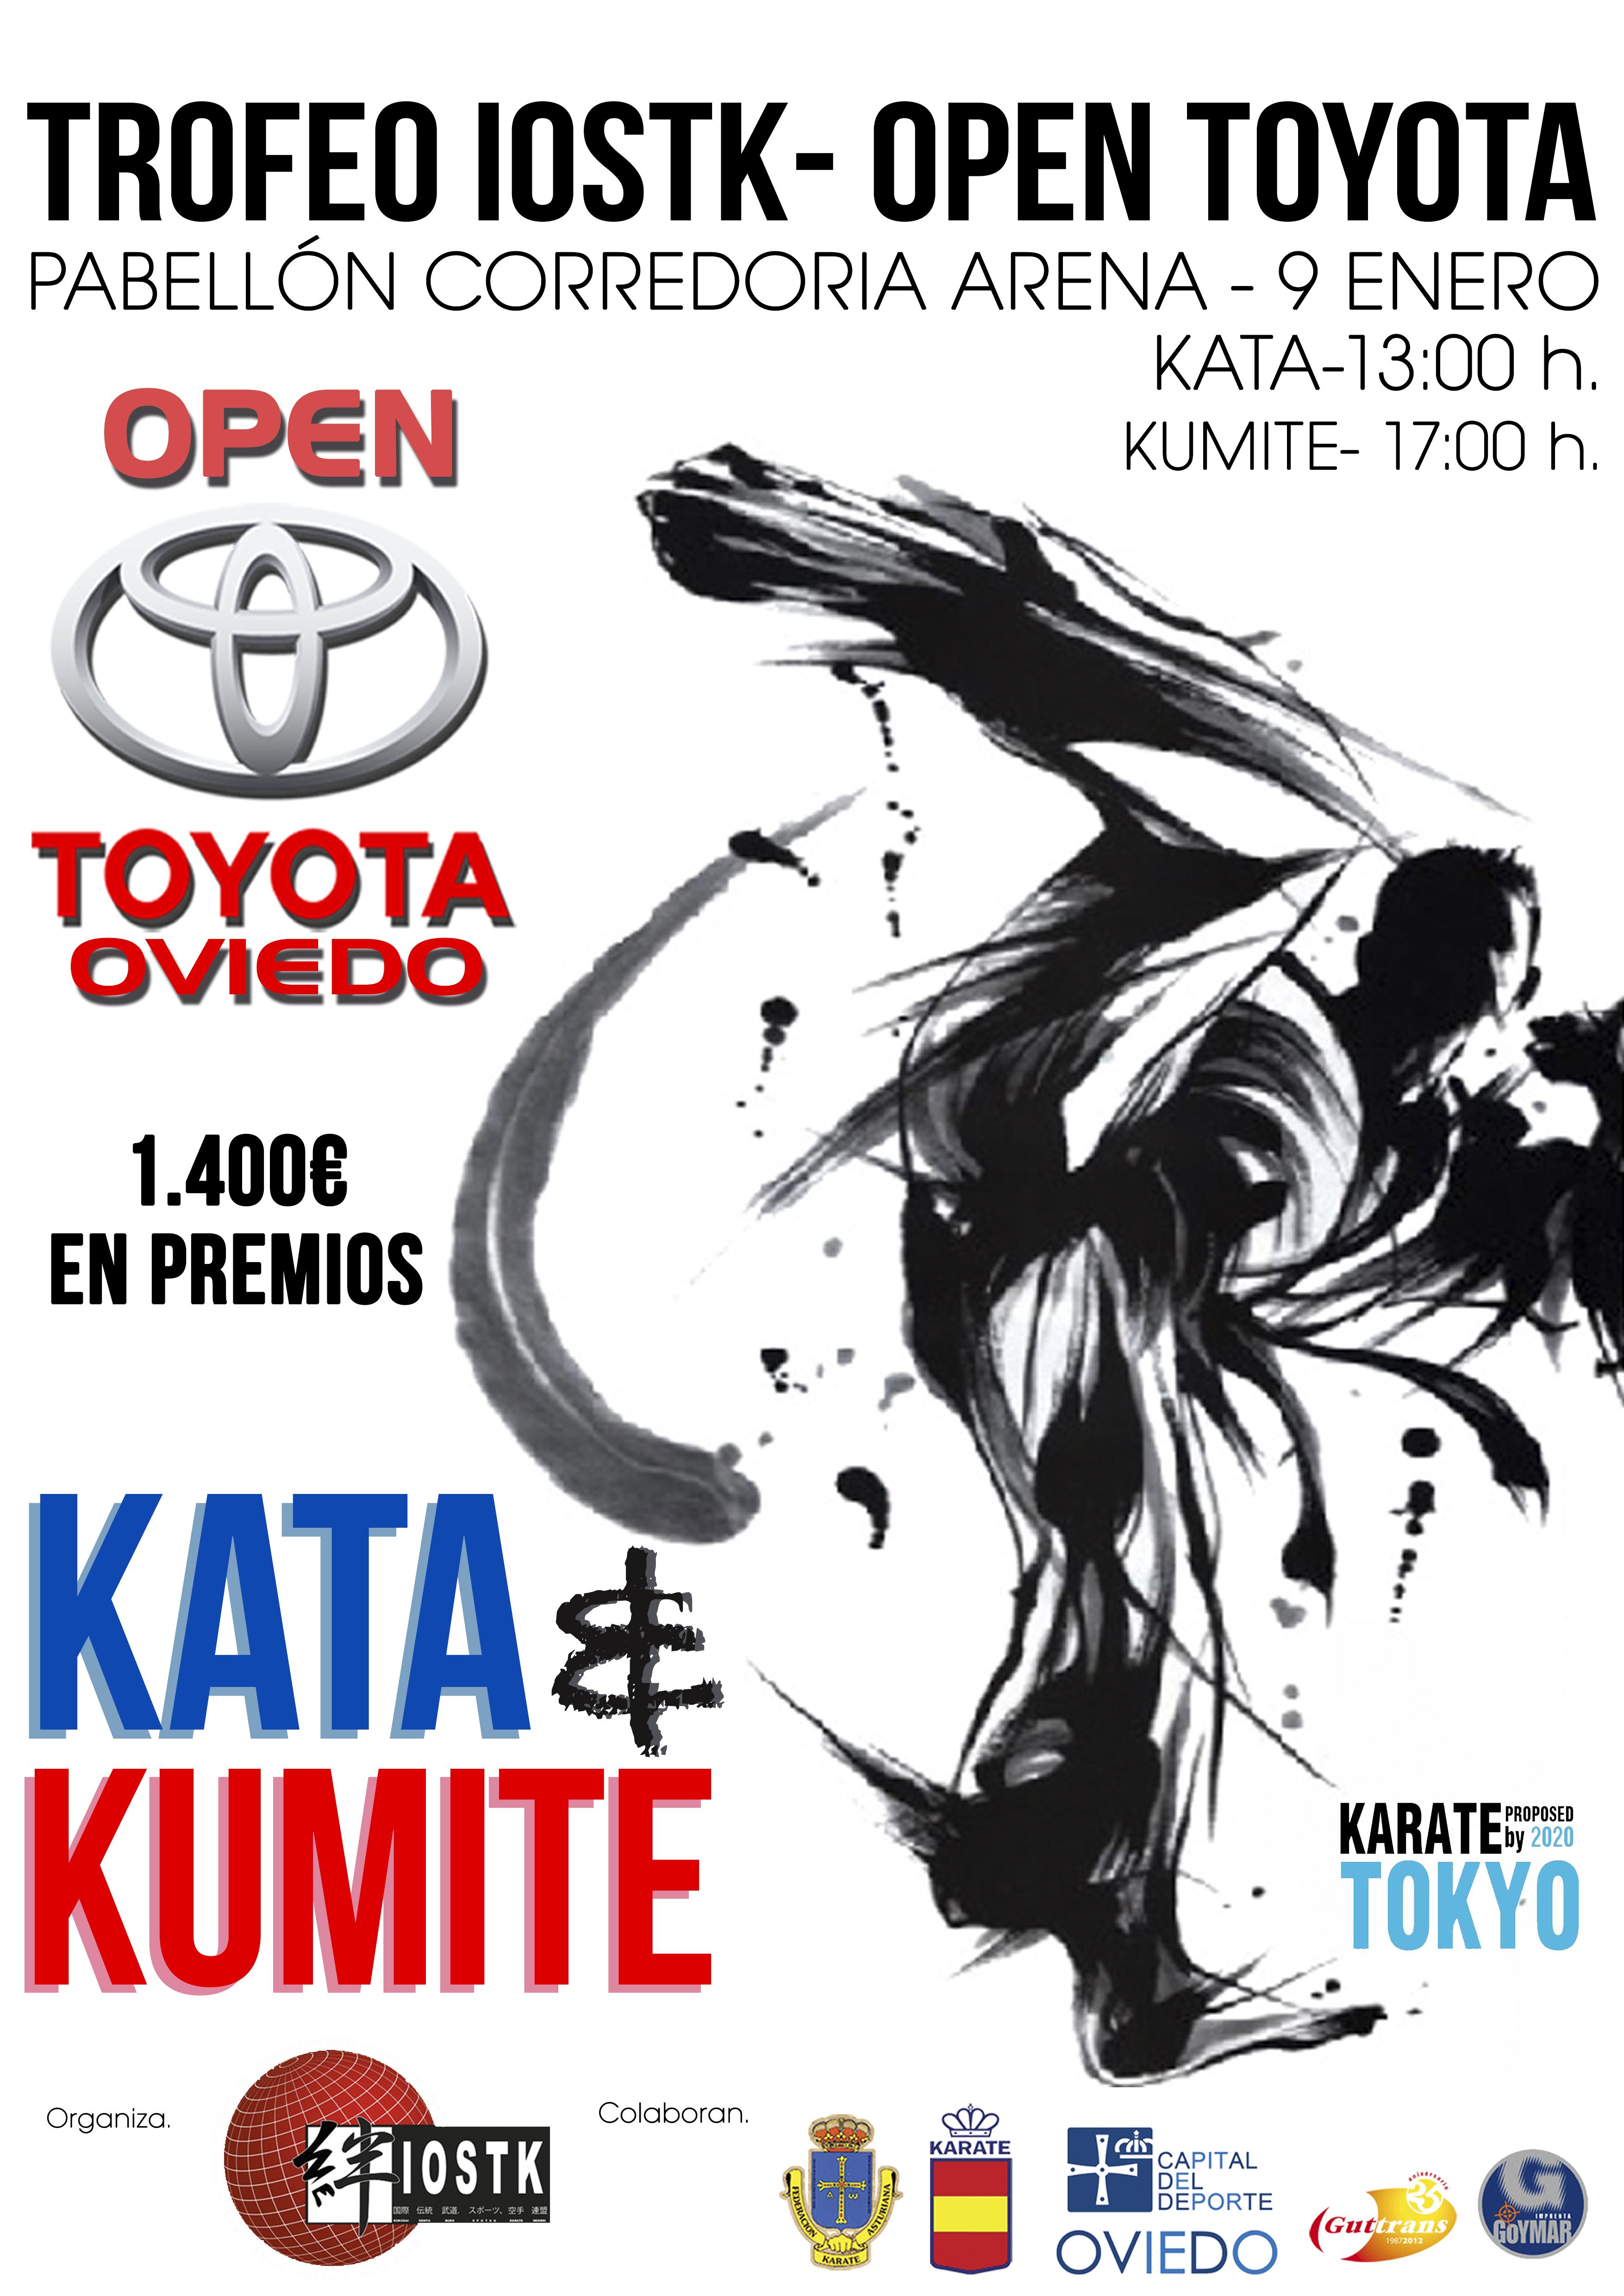 Trofeo IOSTK - OPEN TOYOTA-1